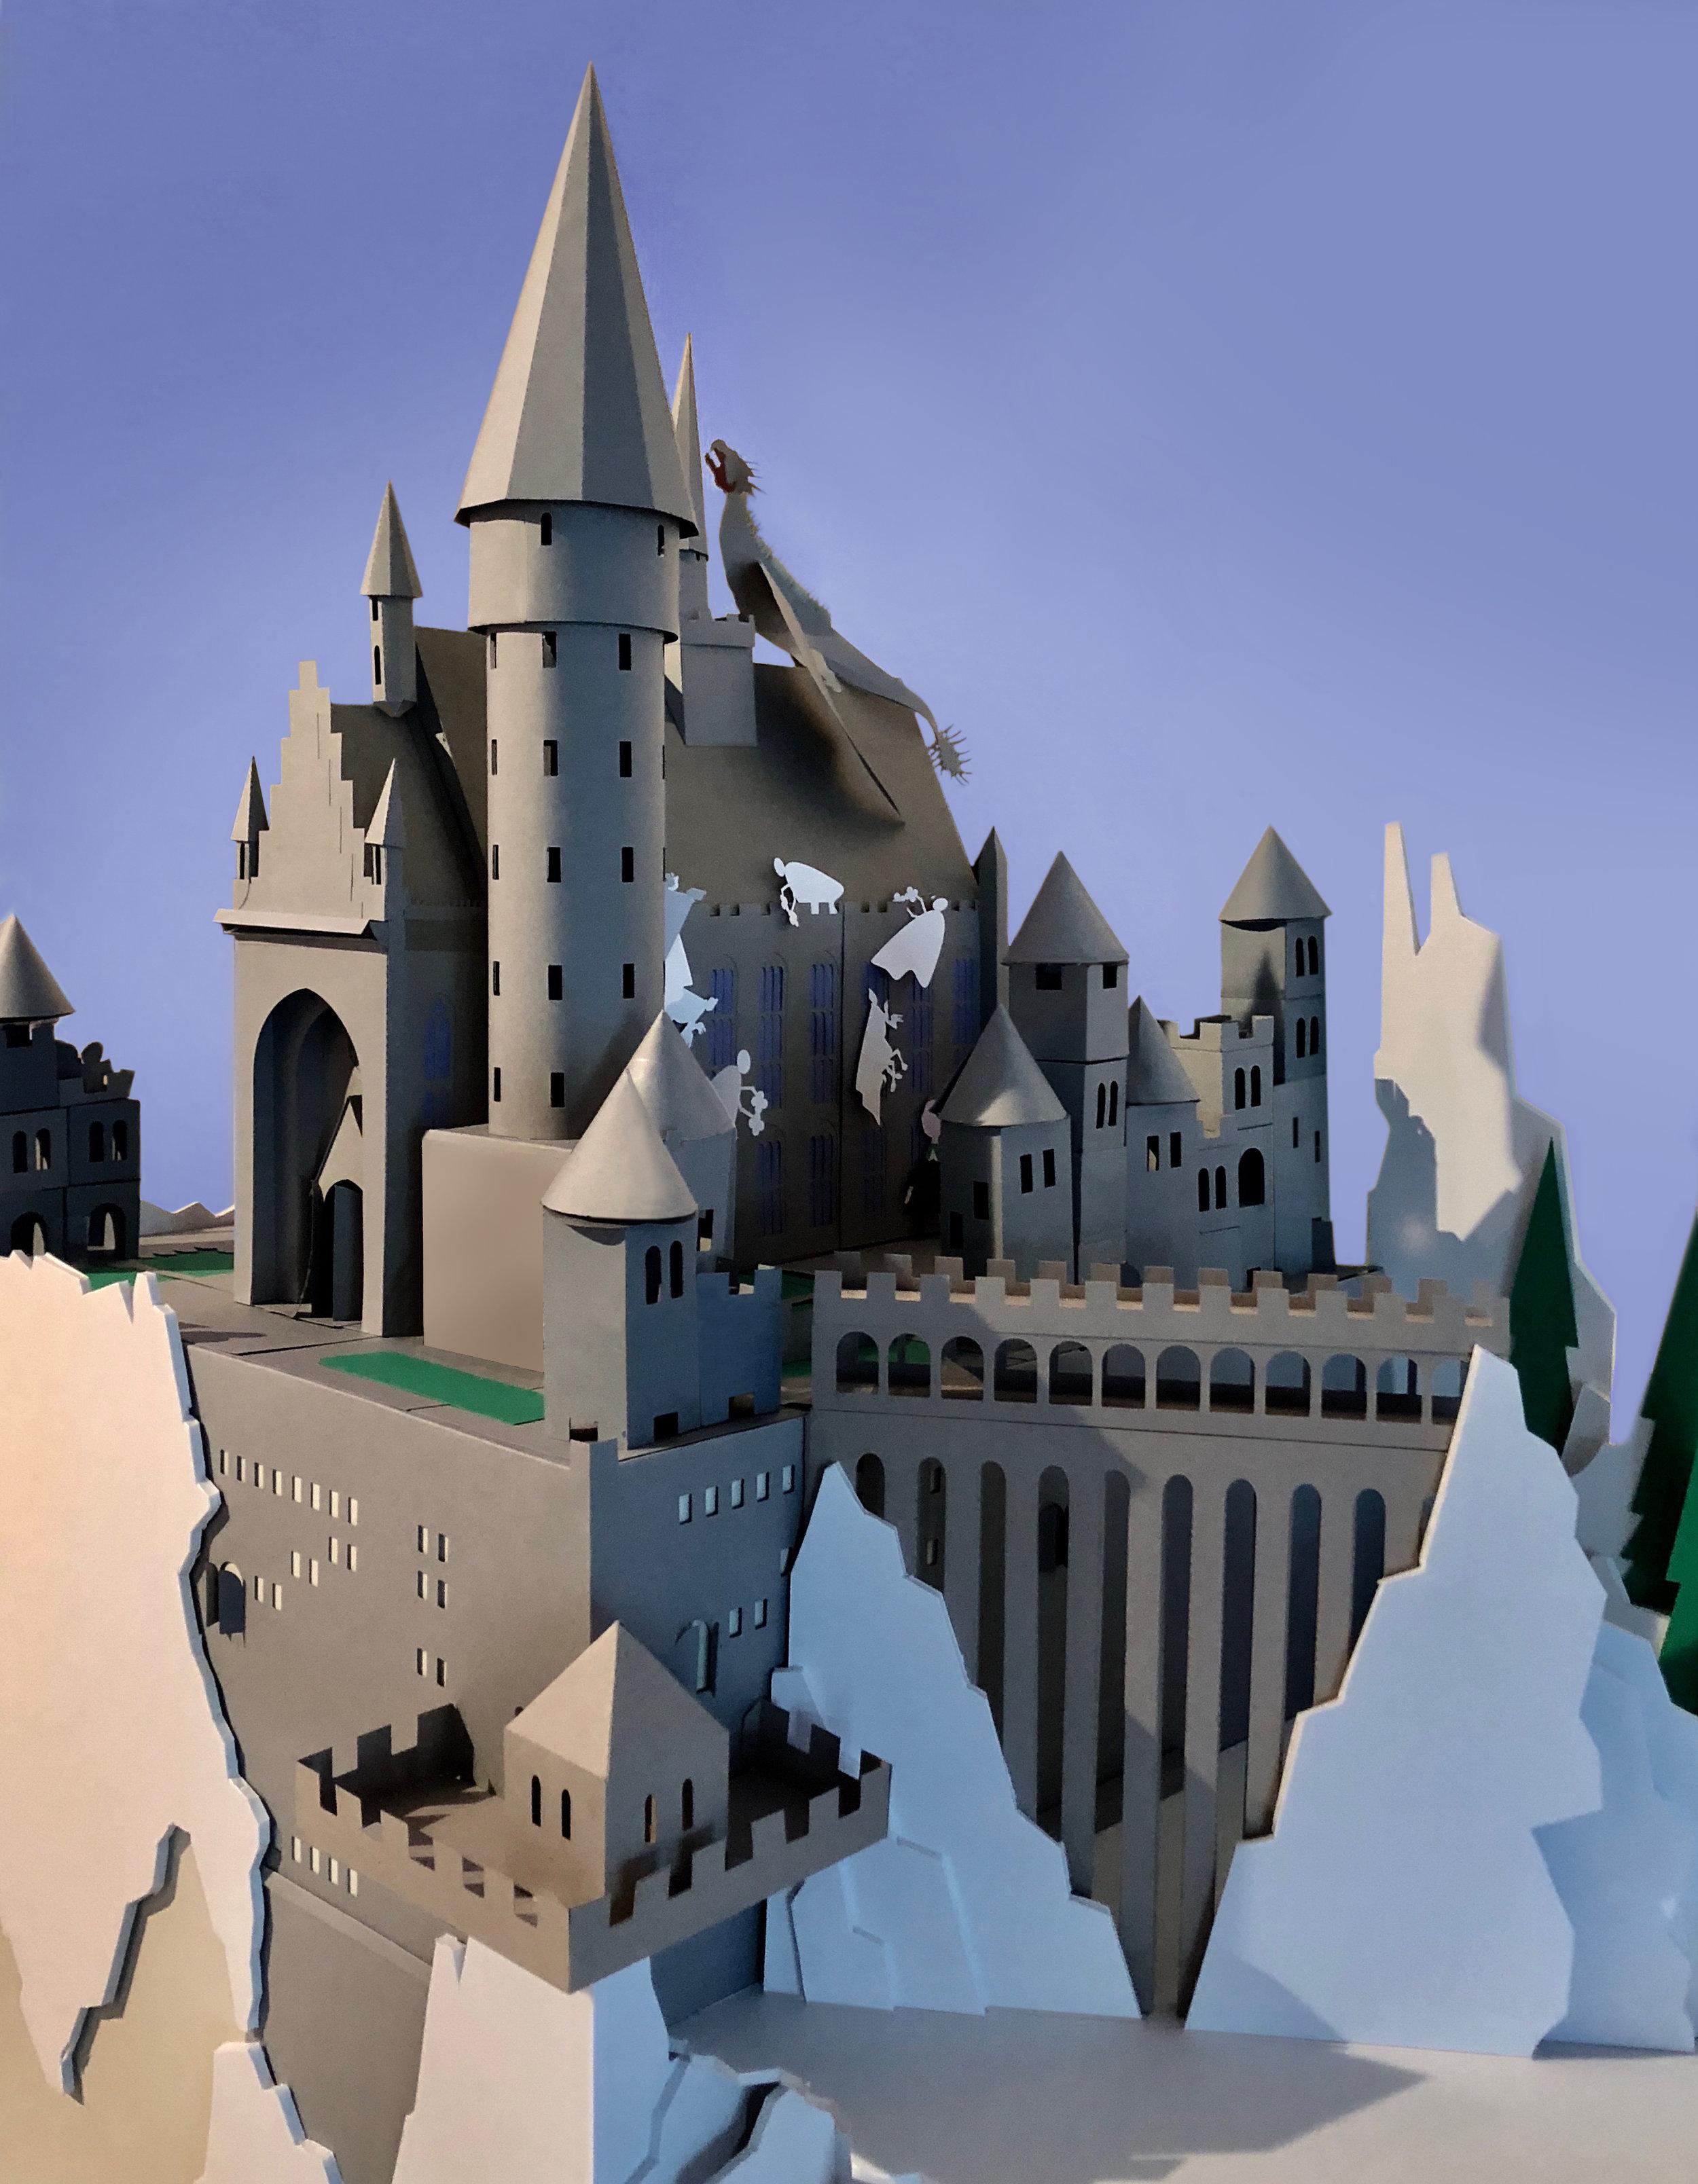 25 Hogwarts and the Dragon.jpg